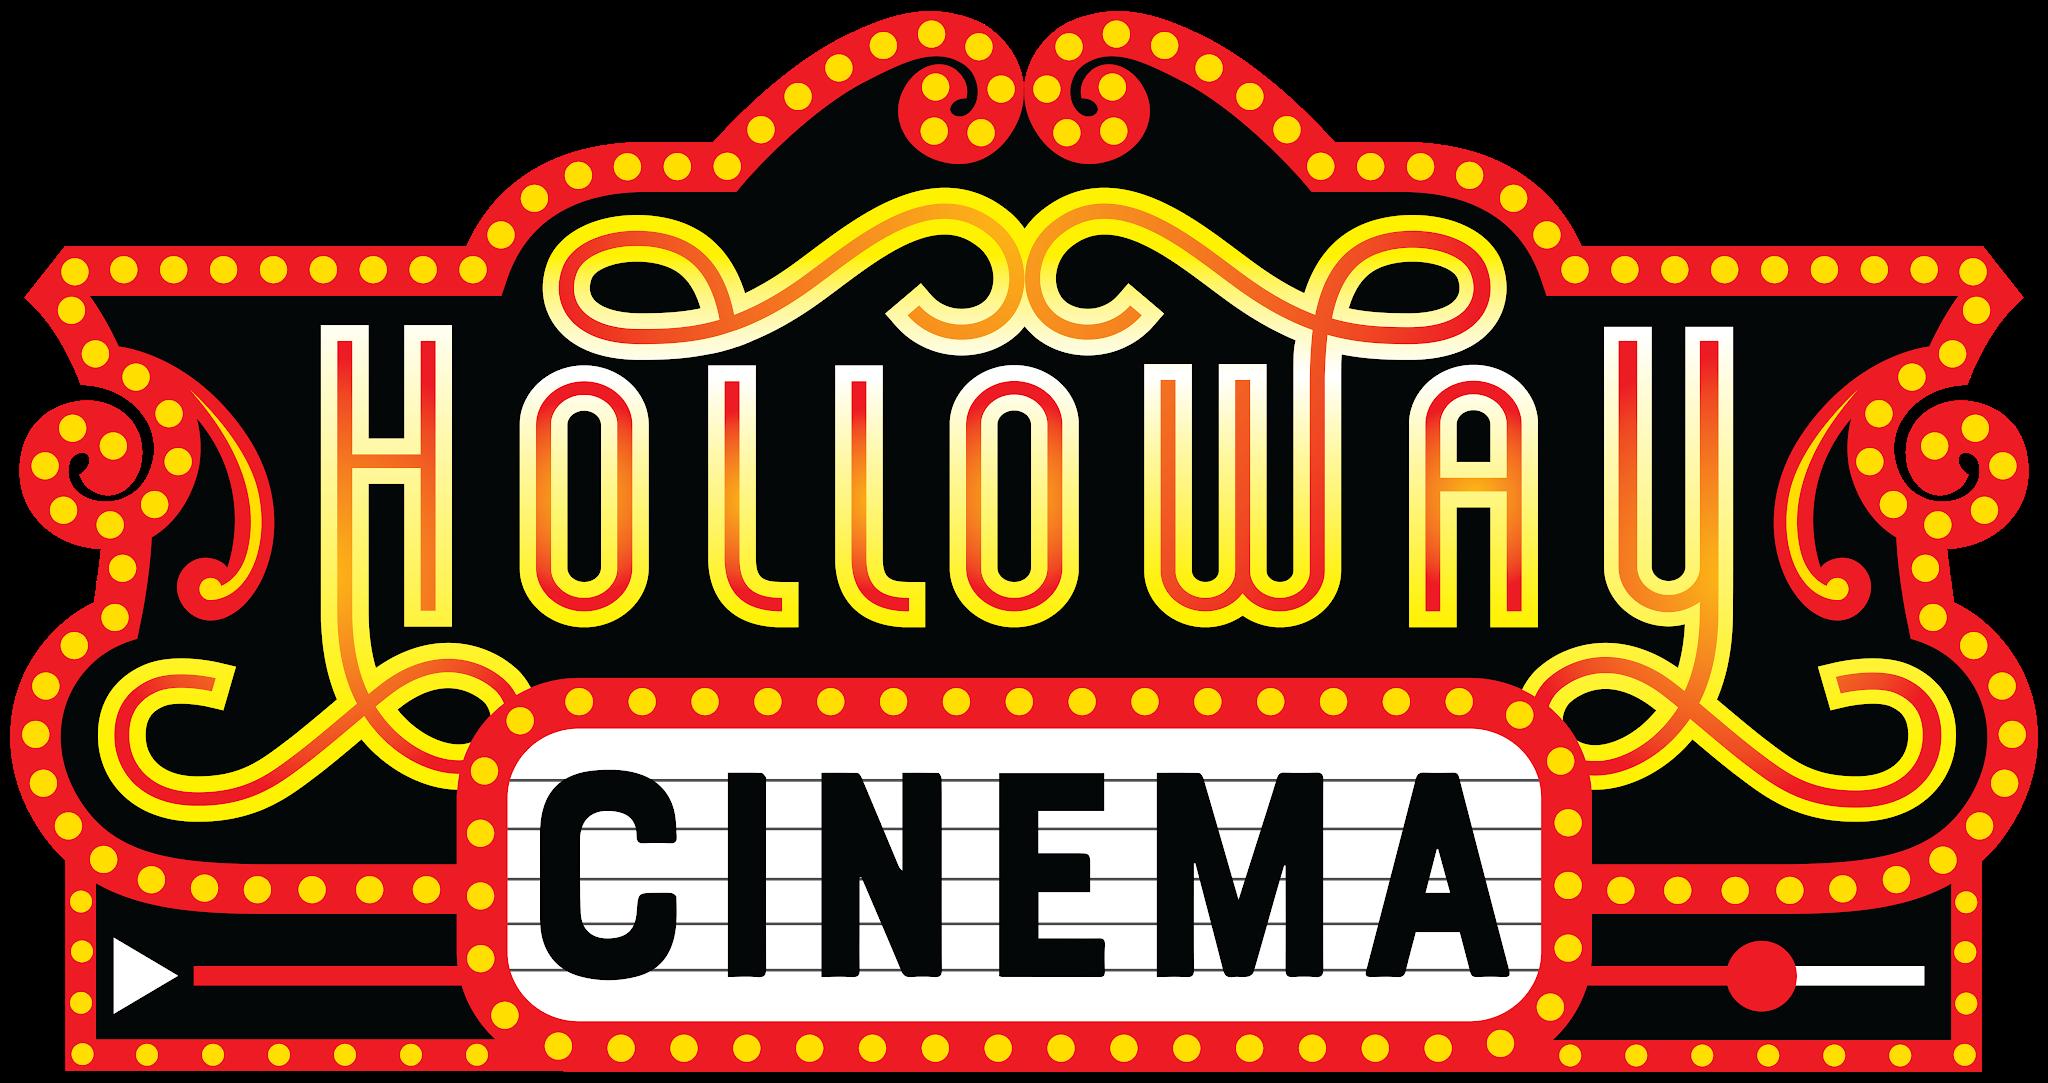 Holloway Cinema